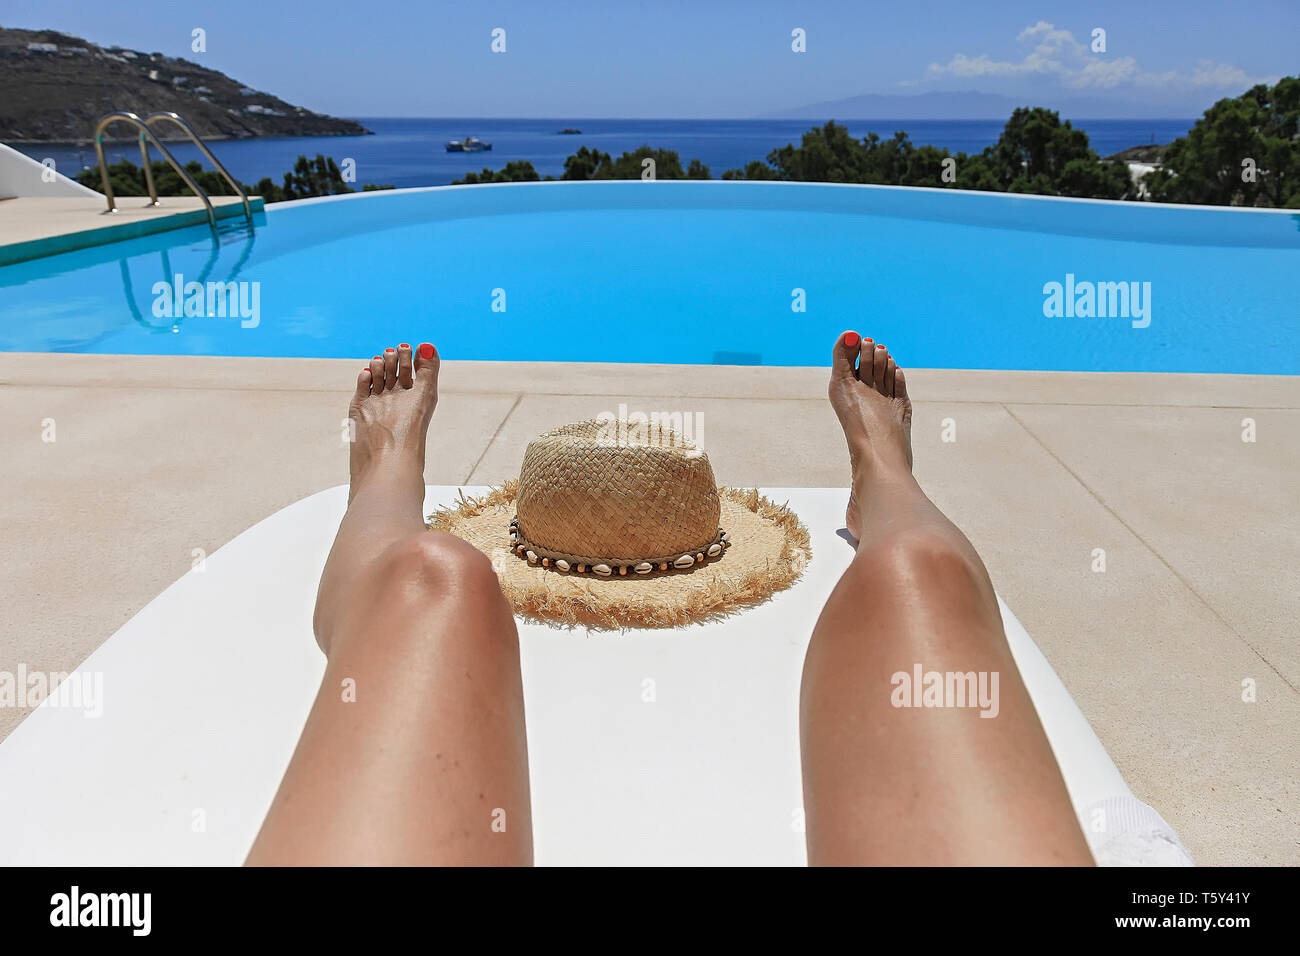 Female Legs Sunbathing On Patio Chaise Lounge Chair Near